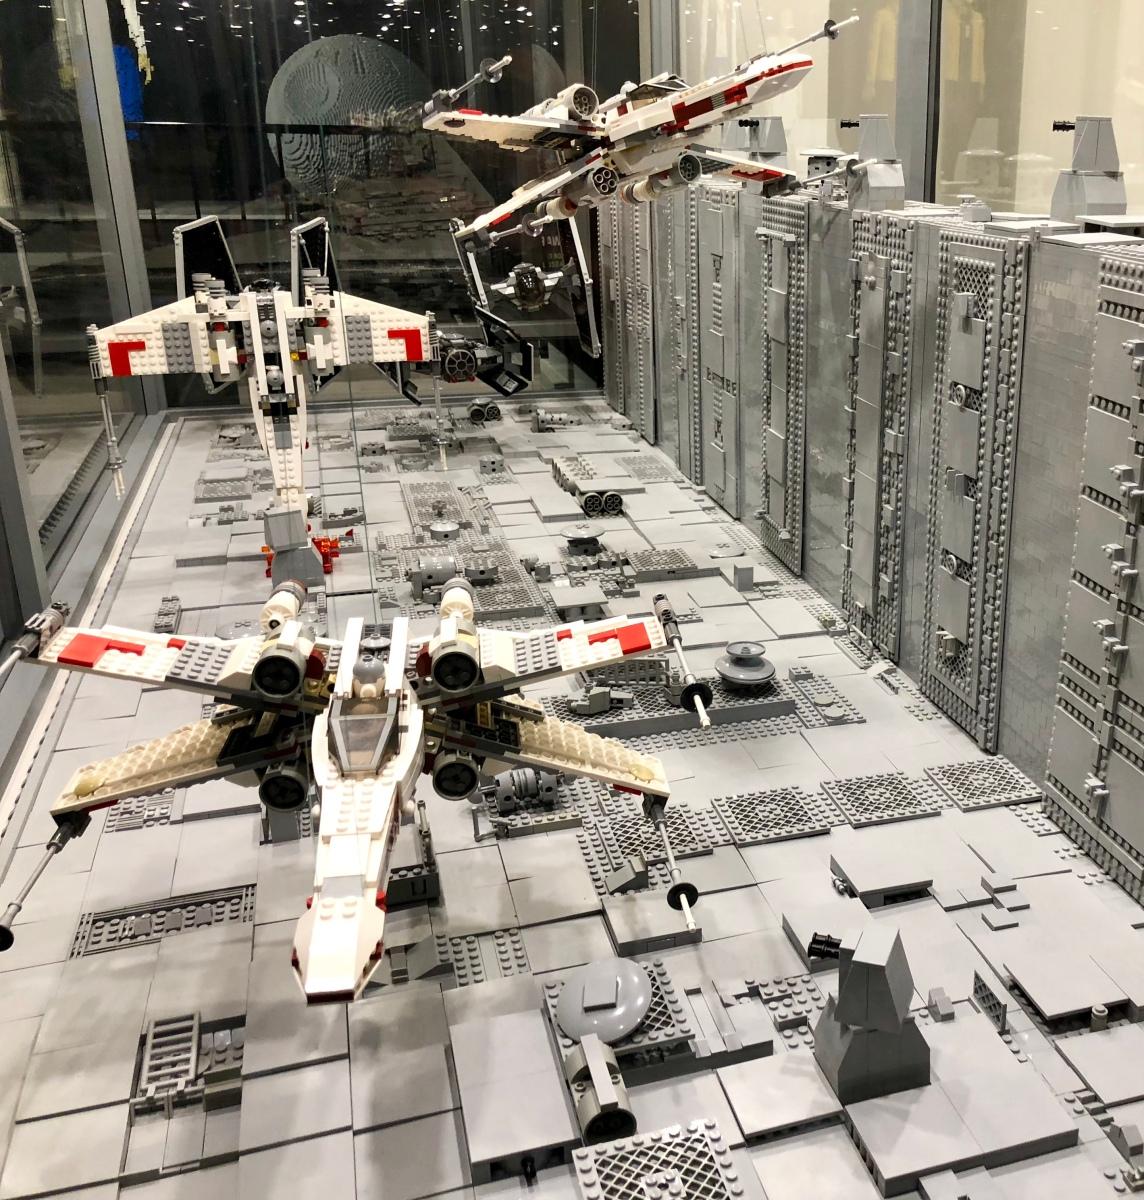 img 0358 Photo Story: Big Legos for big 'kids'